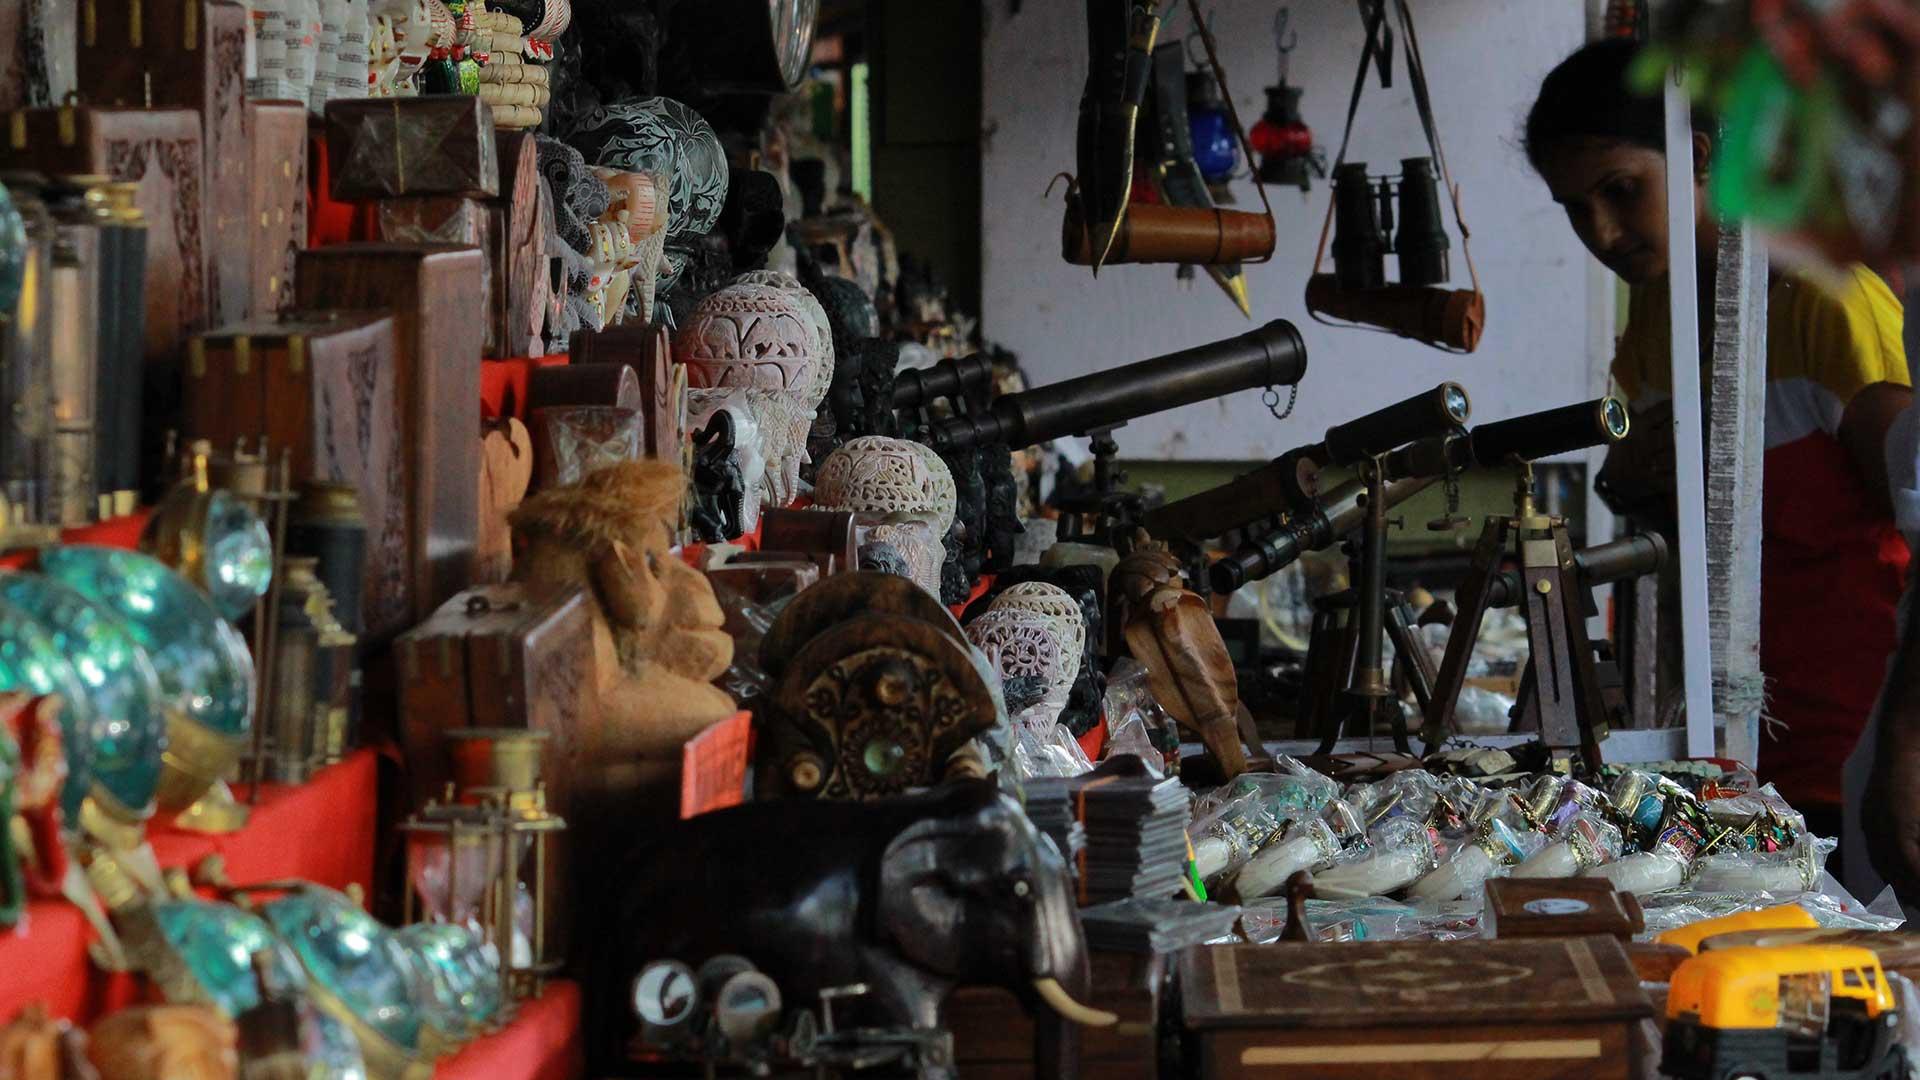 Handicrafts In Shop Jew Street Fort Kochi Dekochi Photo Journal